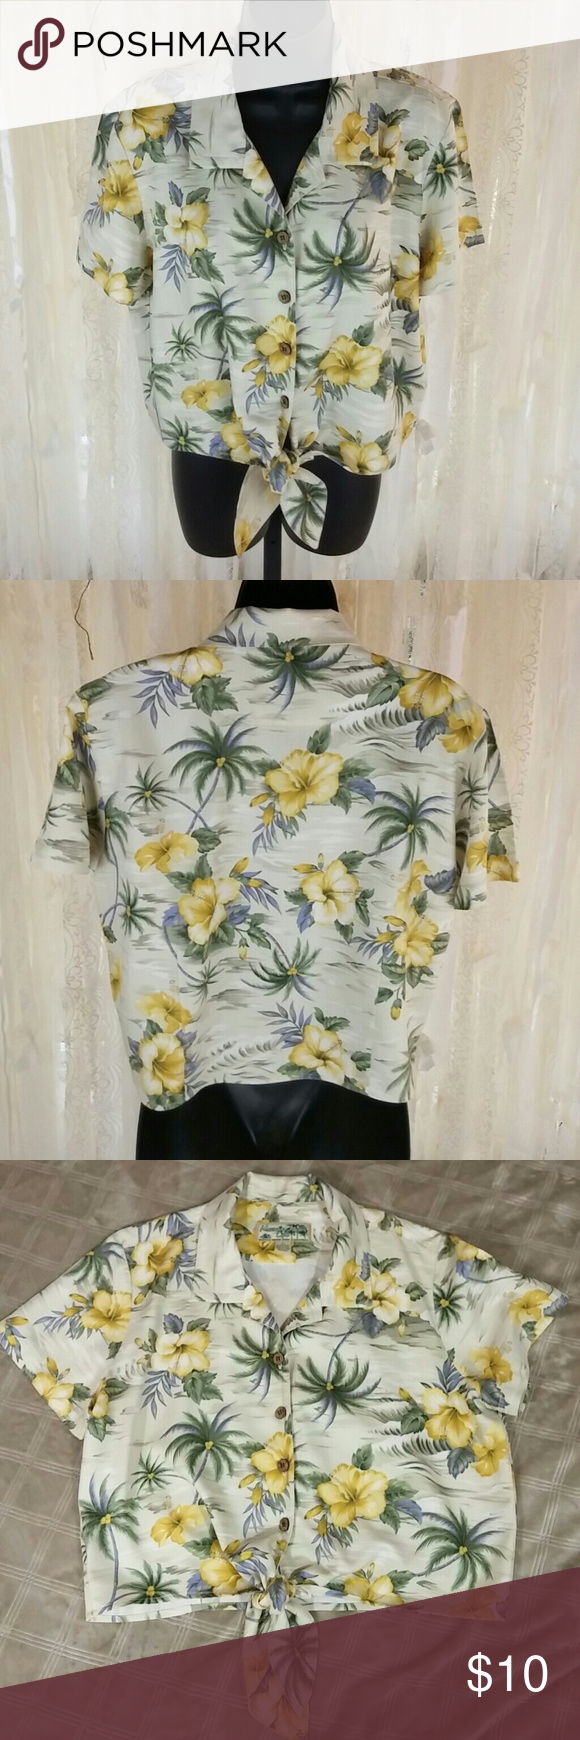 Havana Jacks Cafee shirt A Hawaiian shirt that ties in front, 100% rayon and  size large. Havana Jacks Cafe Tops